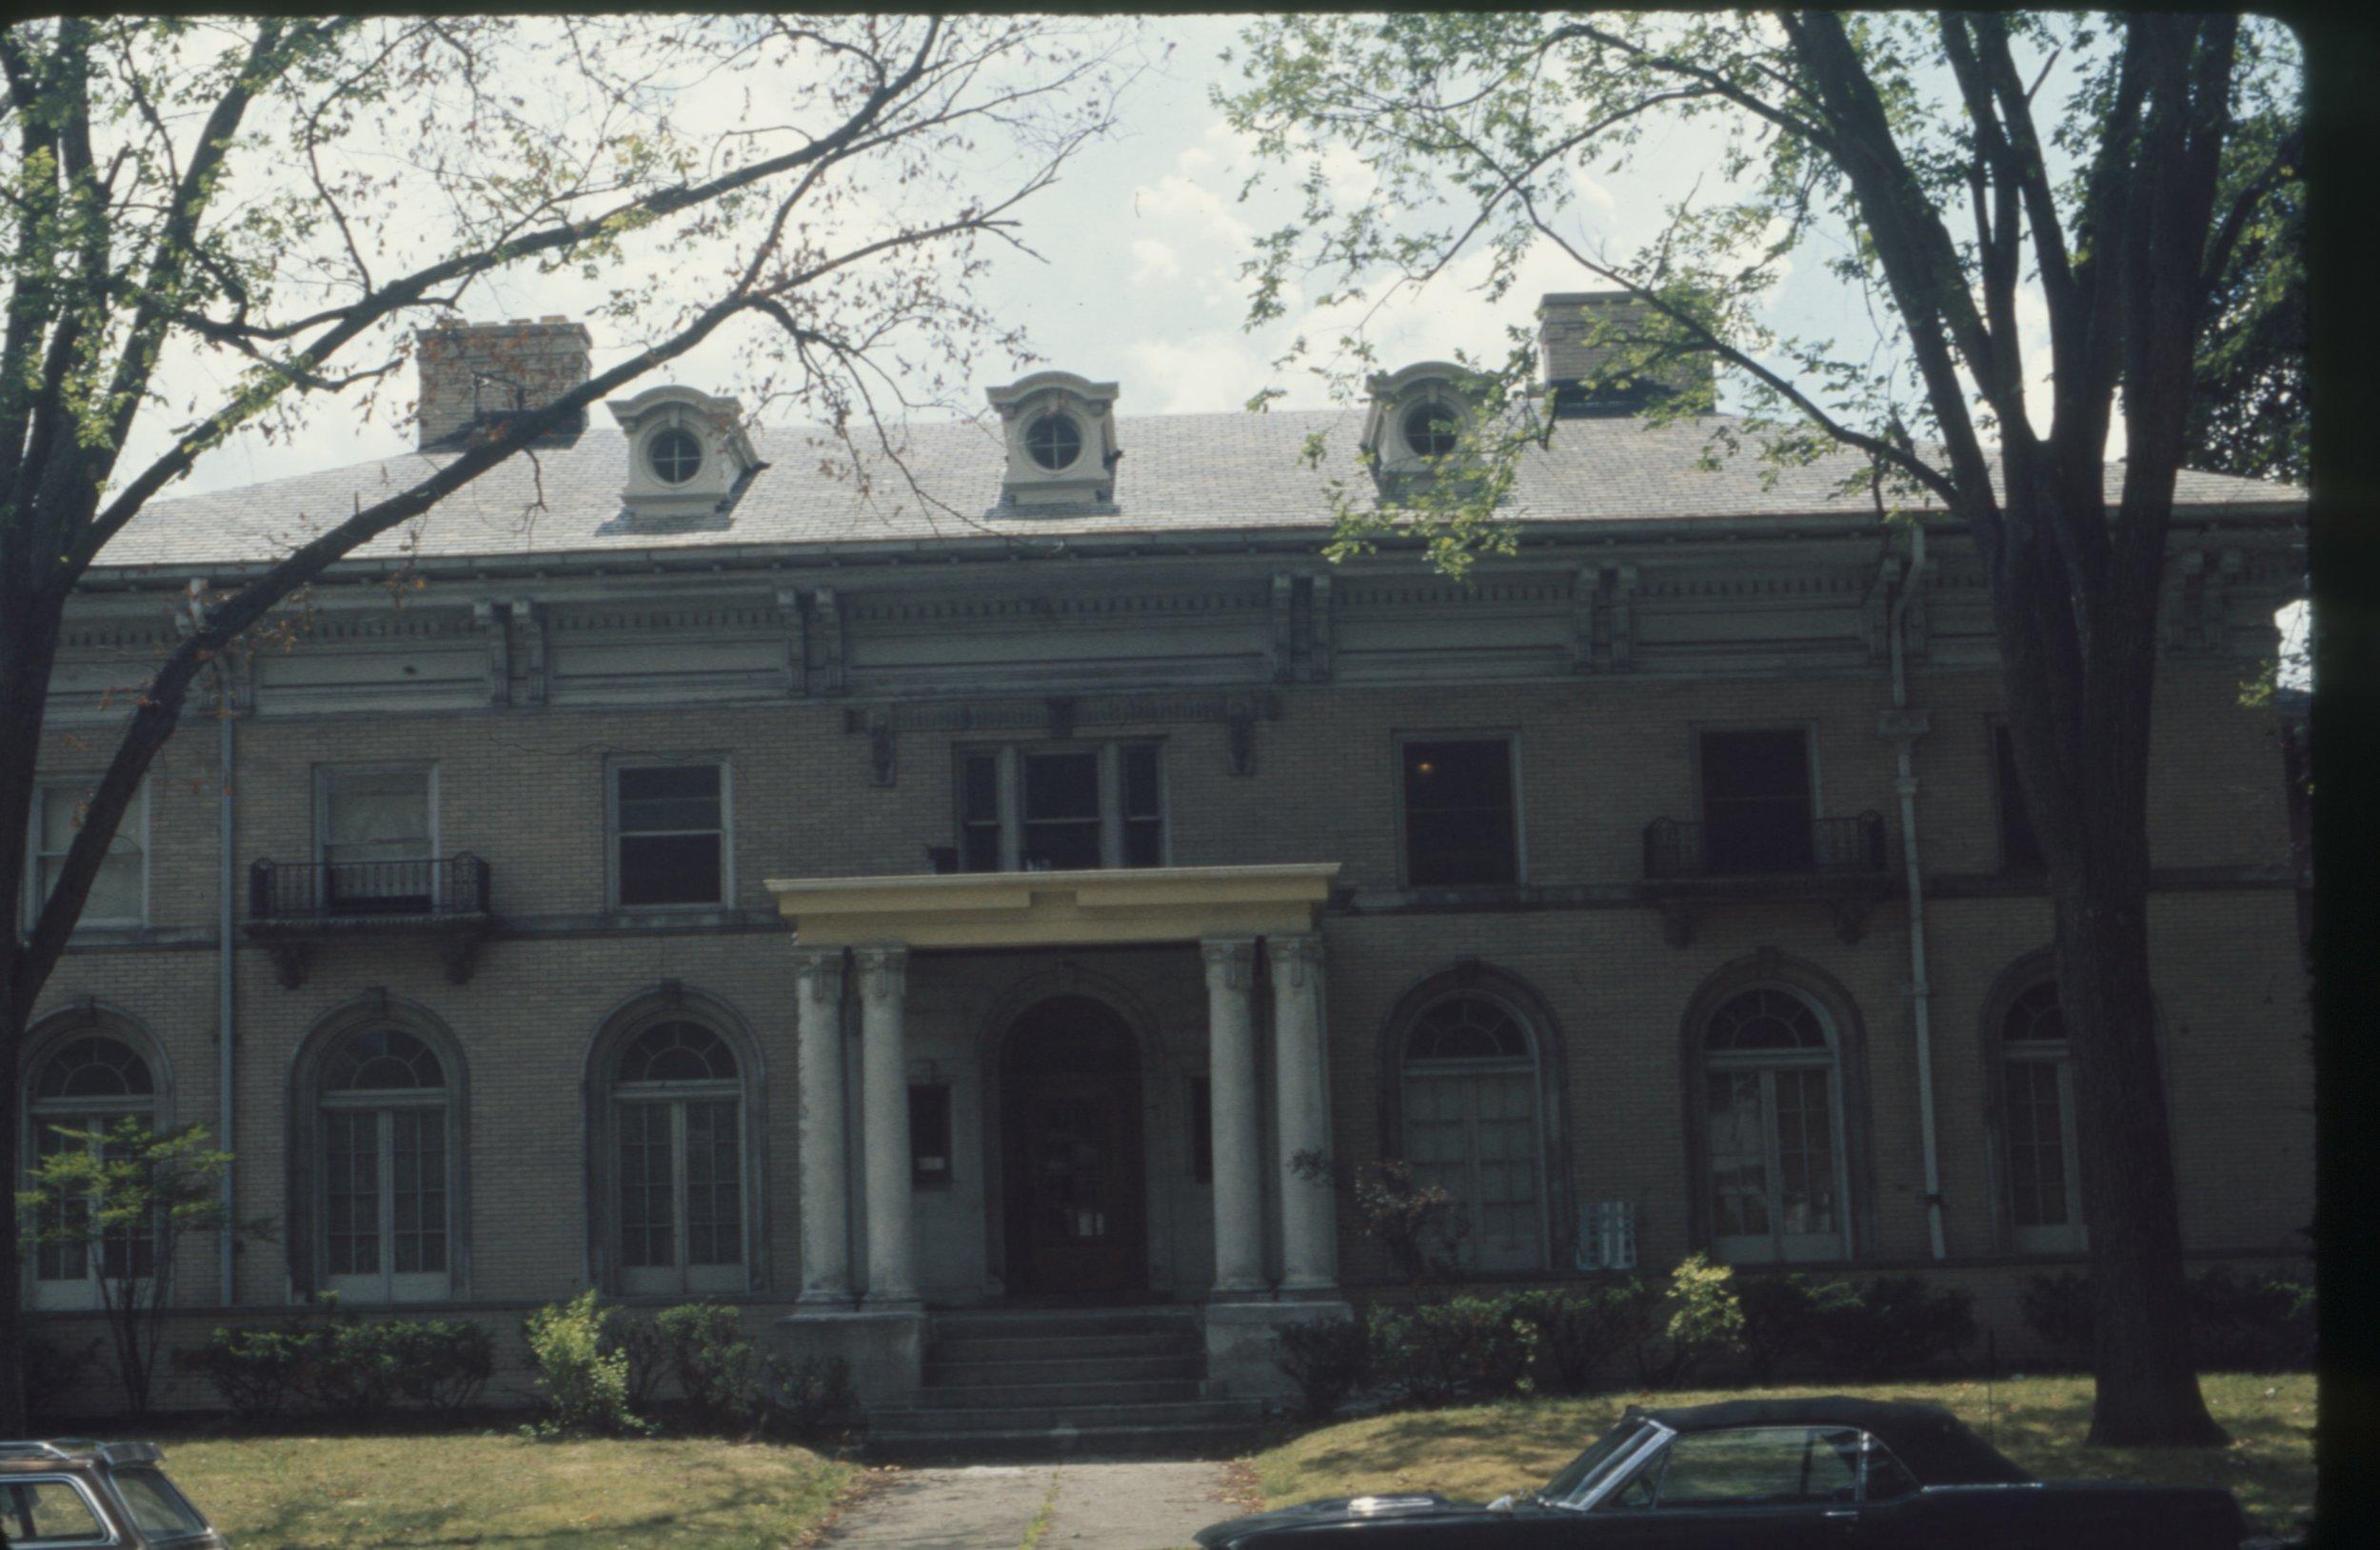 611 W. Boston 1974.jpg